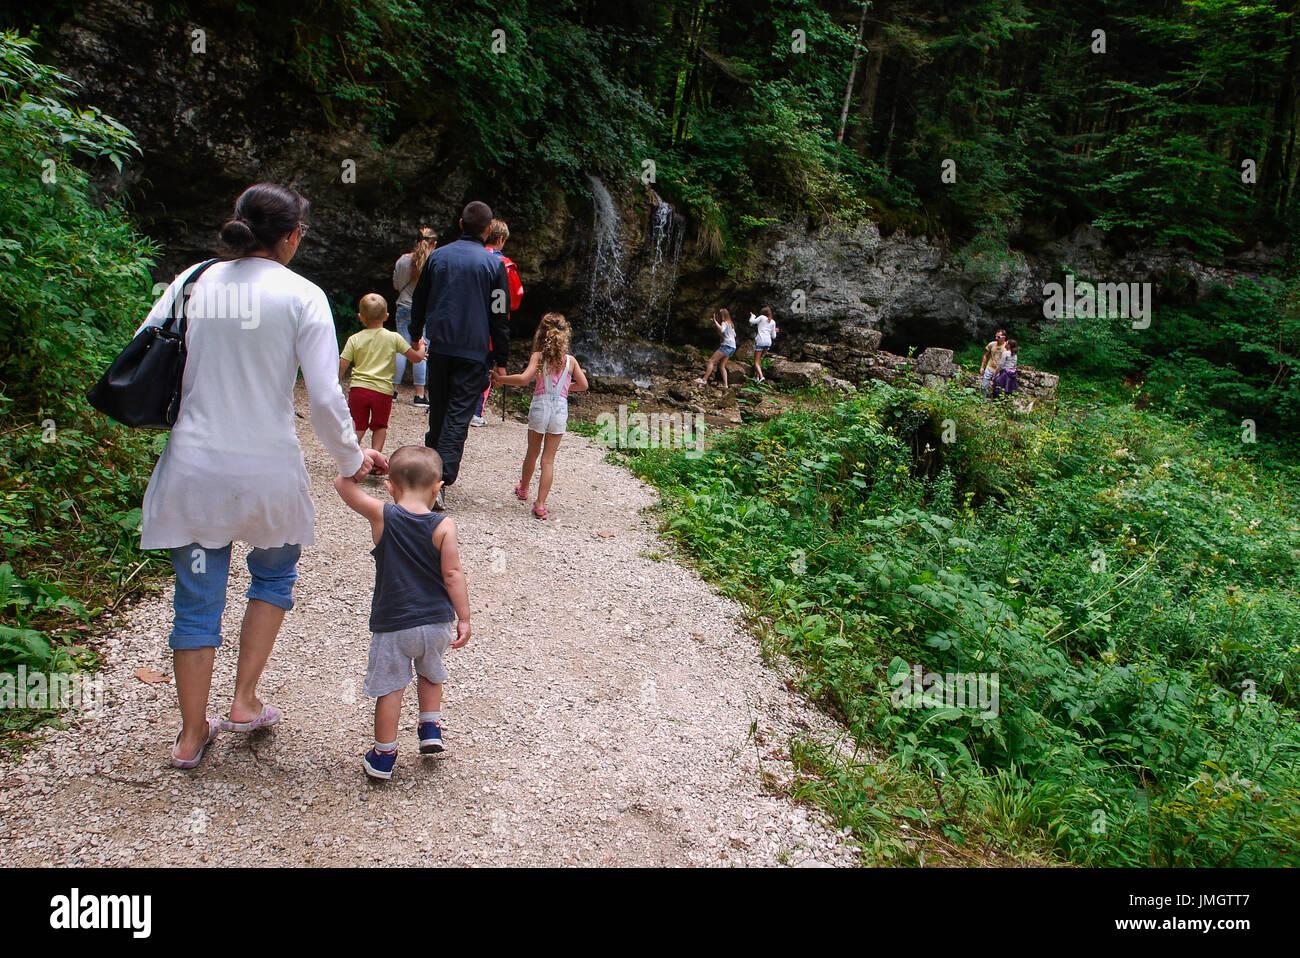 Rambling at the Herisson waterfalls, Haut-Jura, France - Stock Image